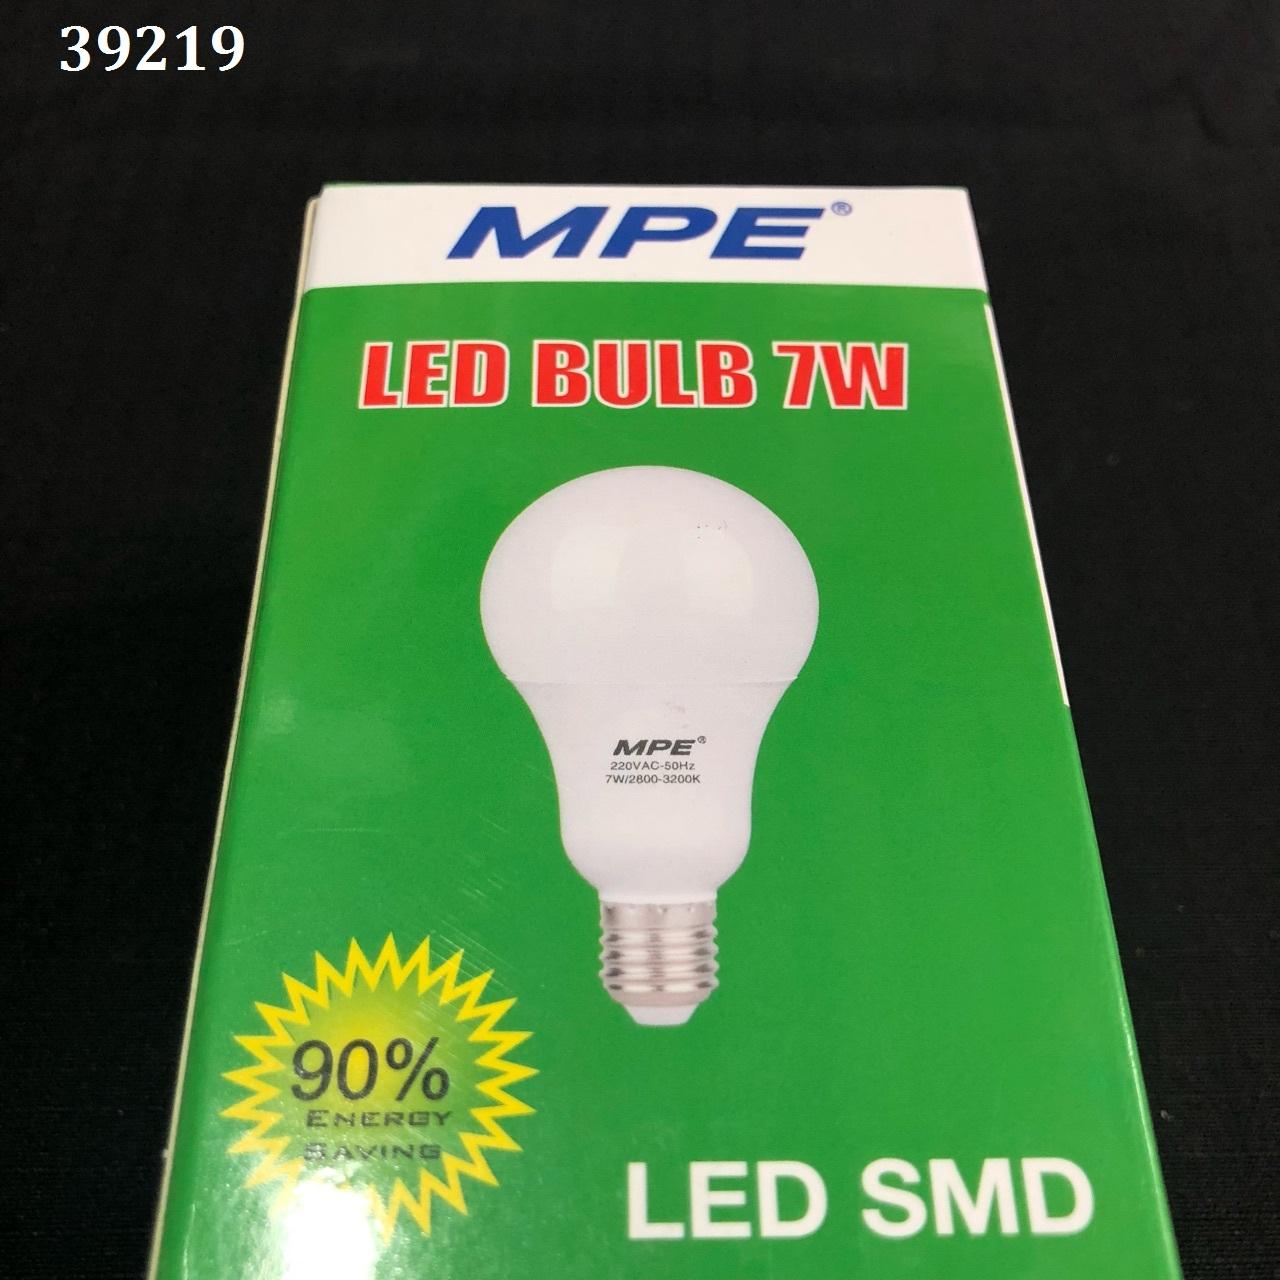 LED bulb 7w a / s yellow LBL-7V MPE